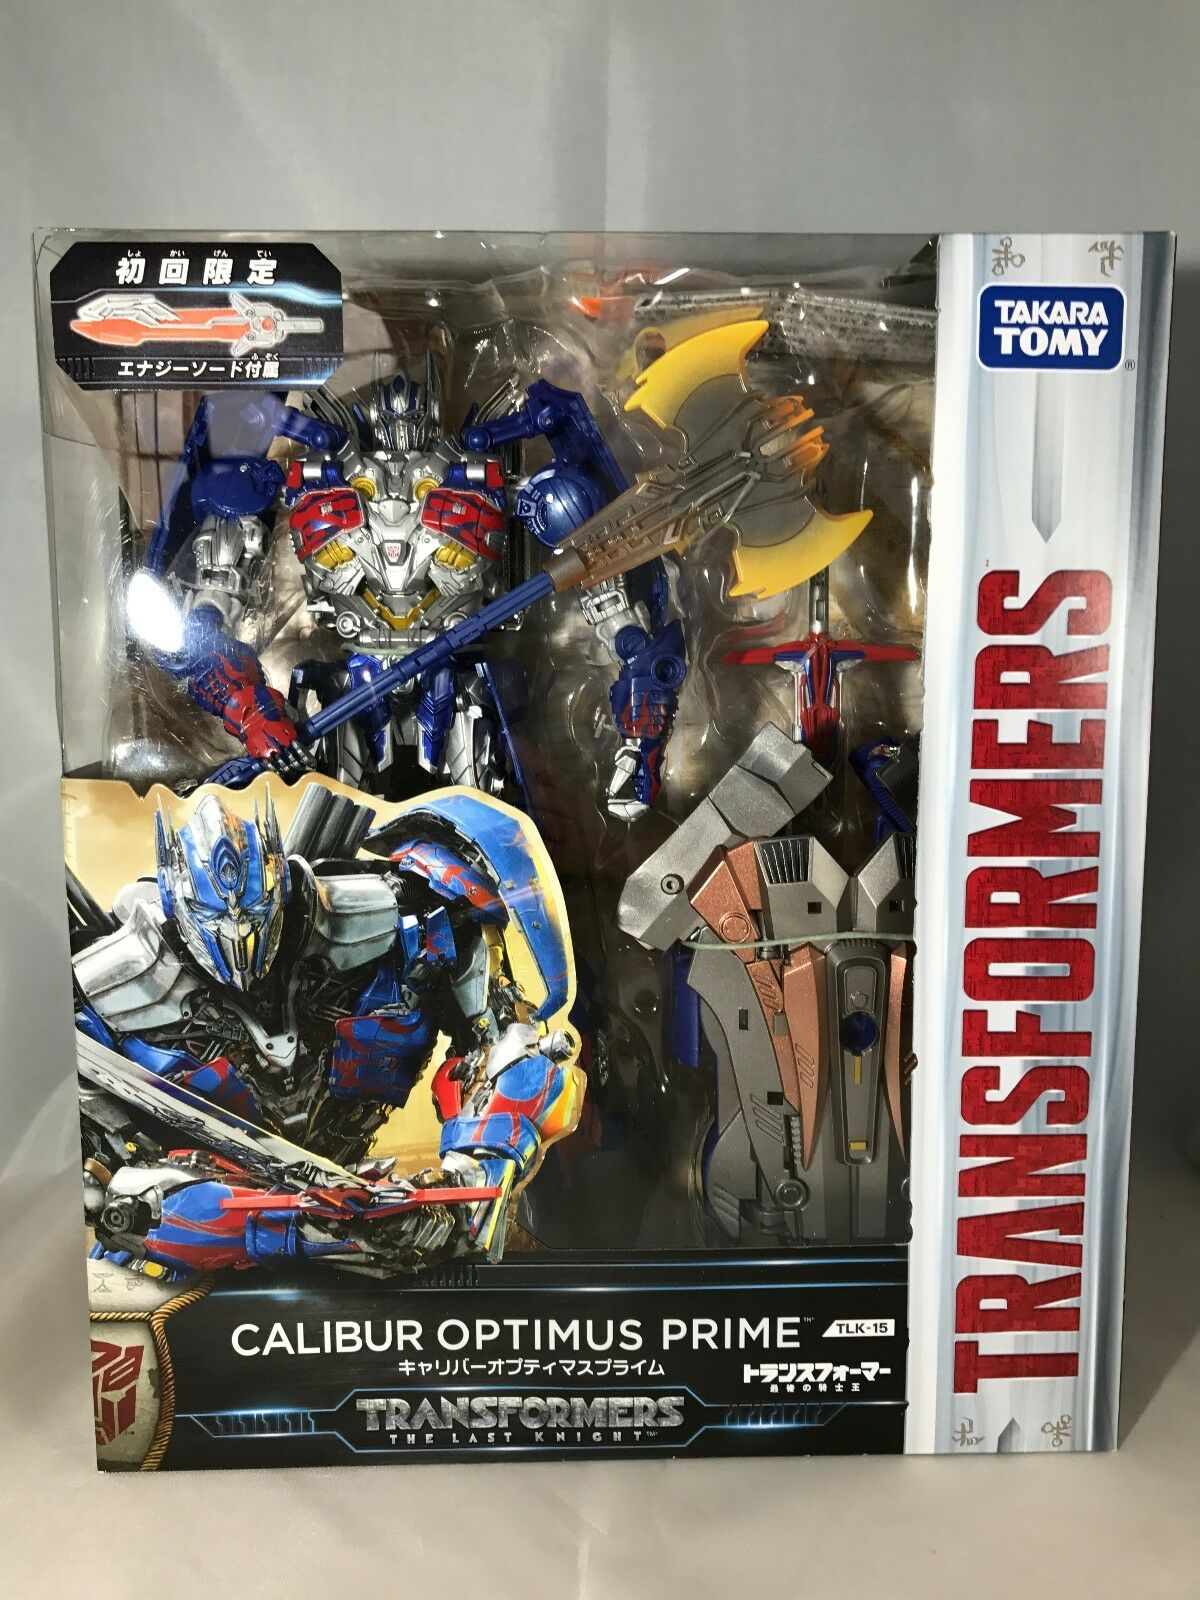 Die tlk-15 calibur optimus prime edition japan